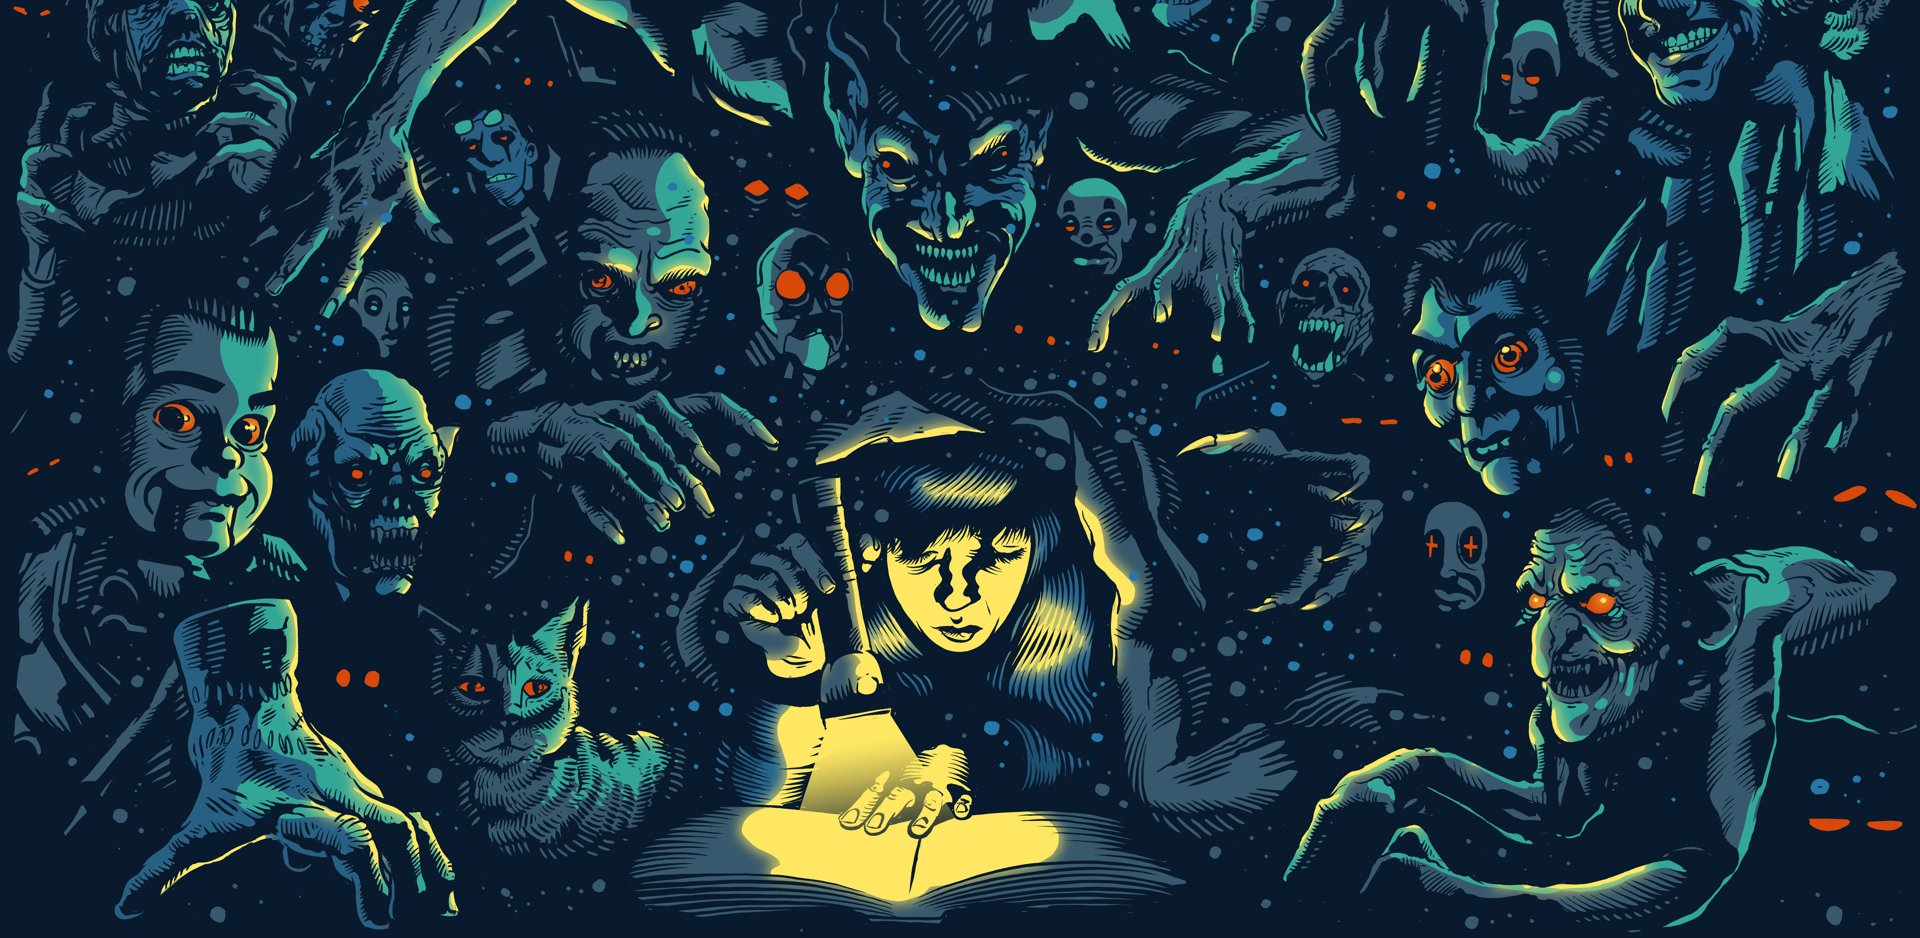 R  L  Stine Still Loves to Terrify Children - The Atlantic